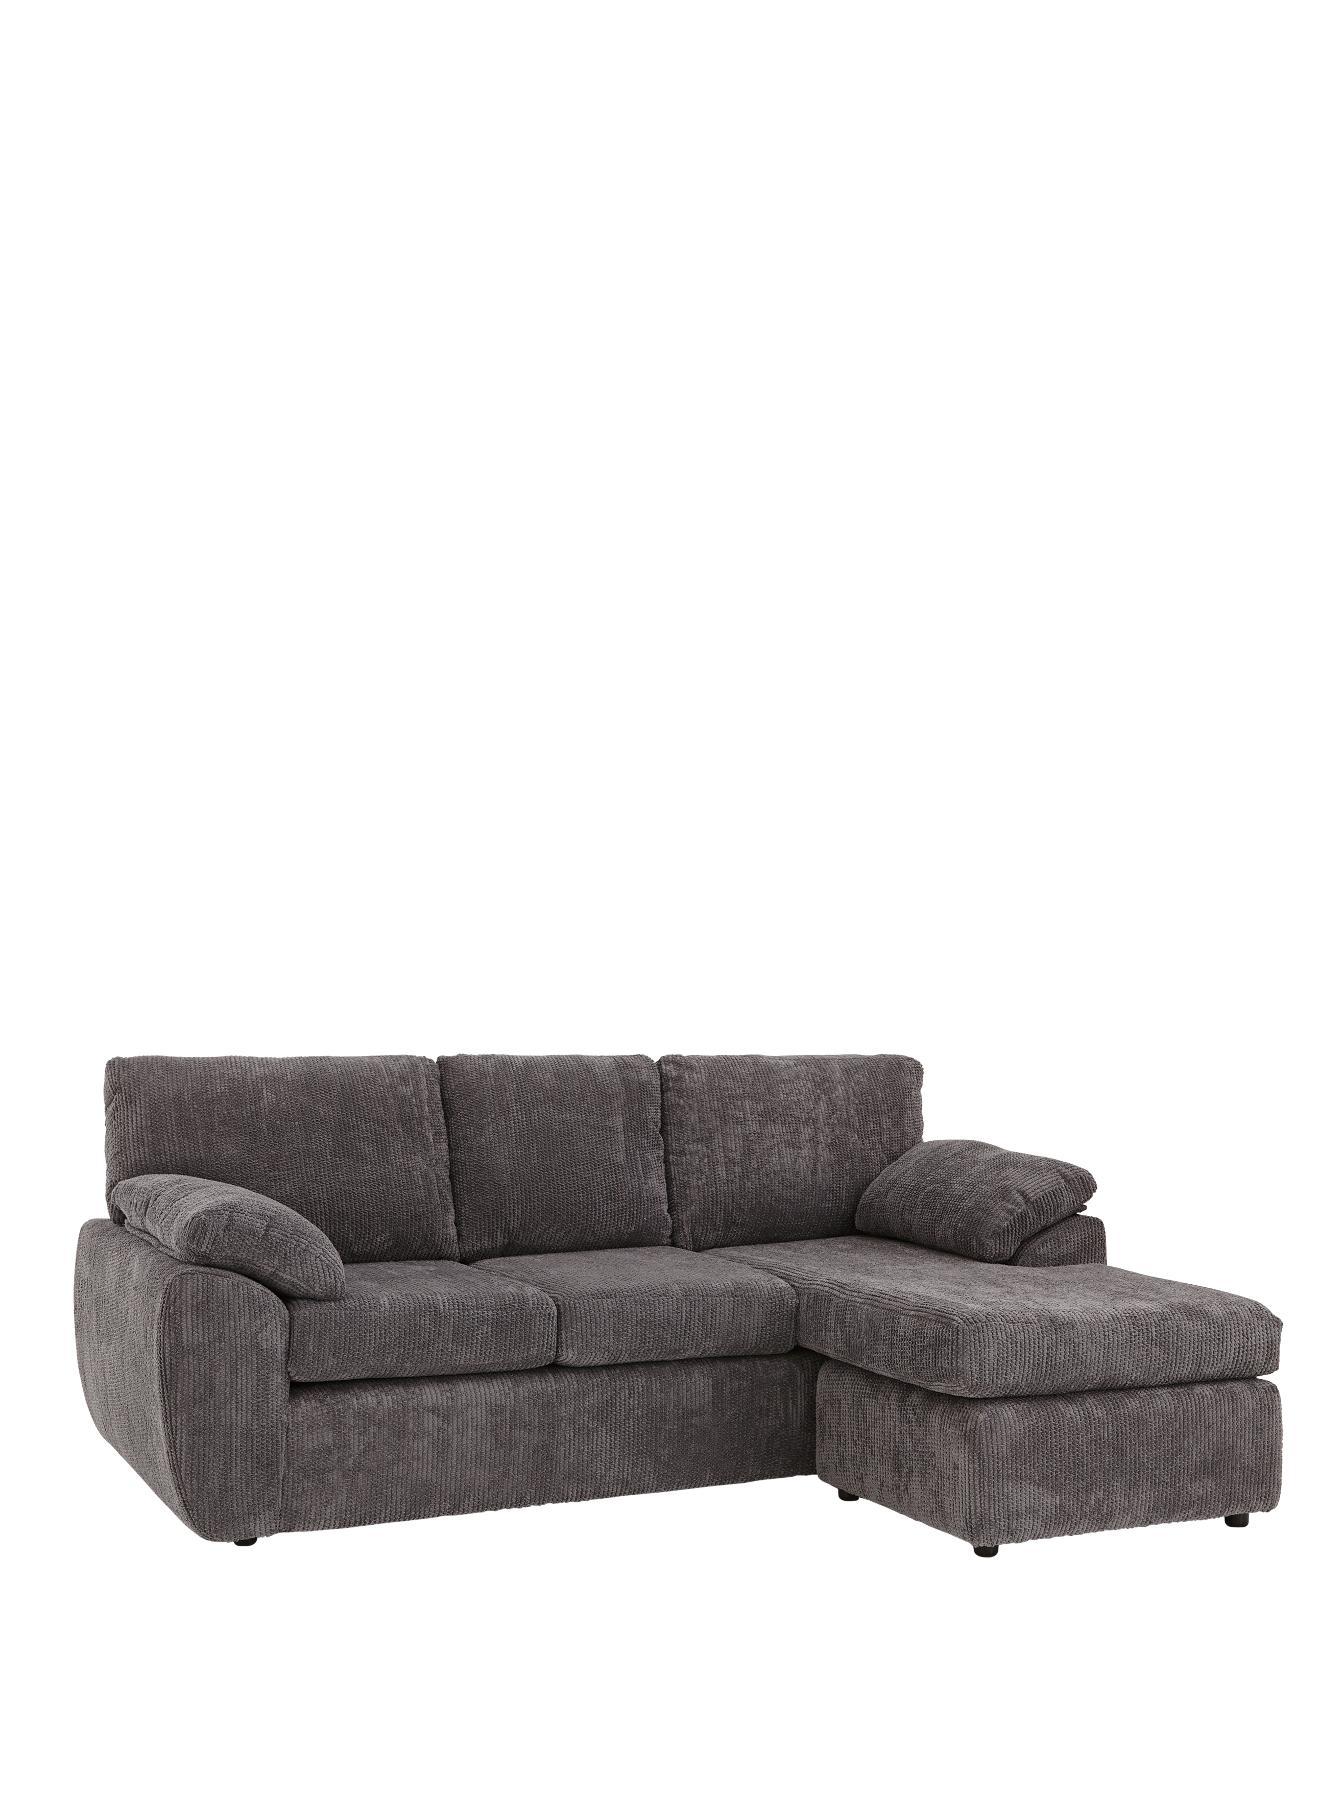 ankara reversible corner sofa hess leather rebecca fabric chaise very co uk